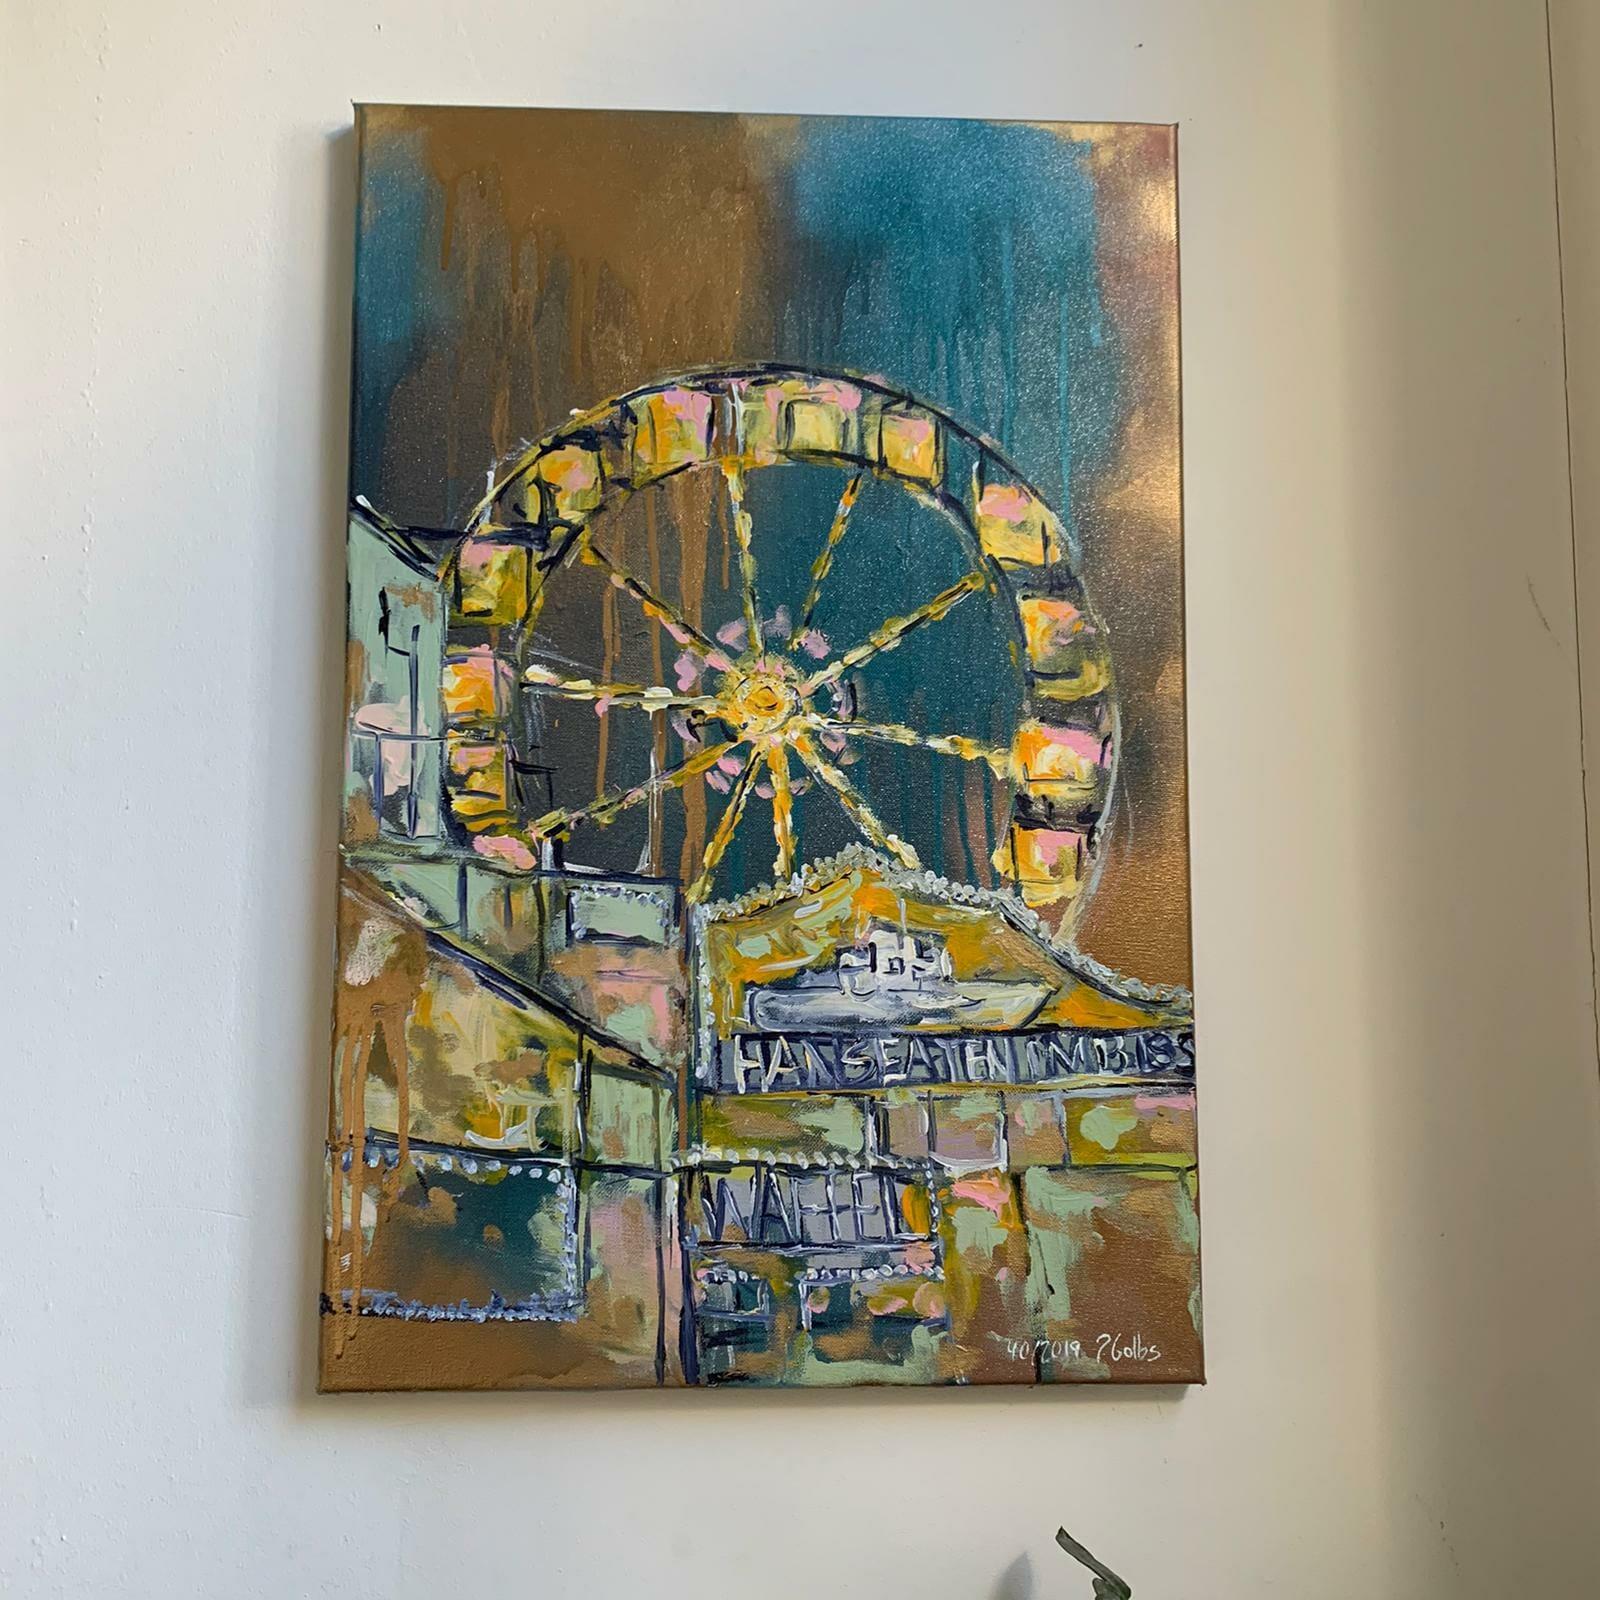 Malinka Ottensen Kostmetik trifft Kunst. Nägeldesign in Hamburg und Kooperation mit Juliane Golbs